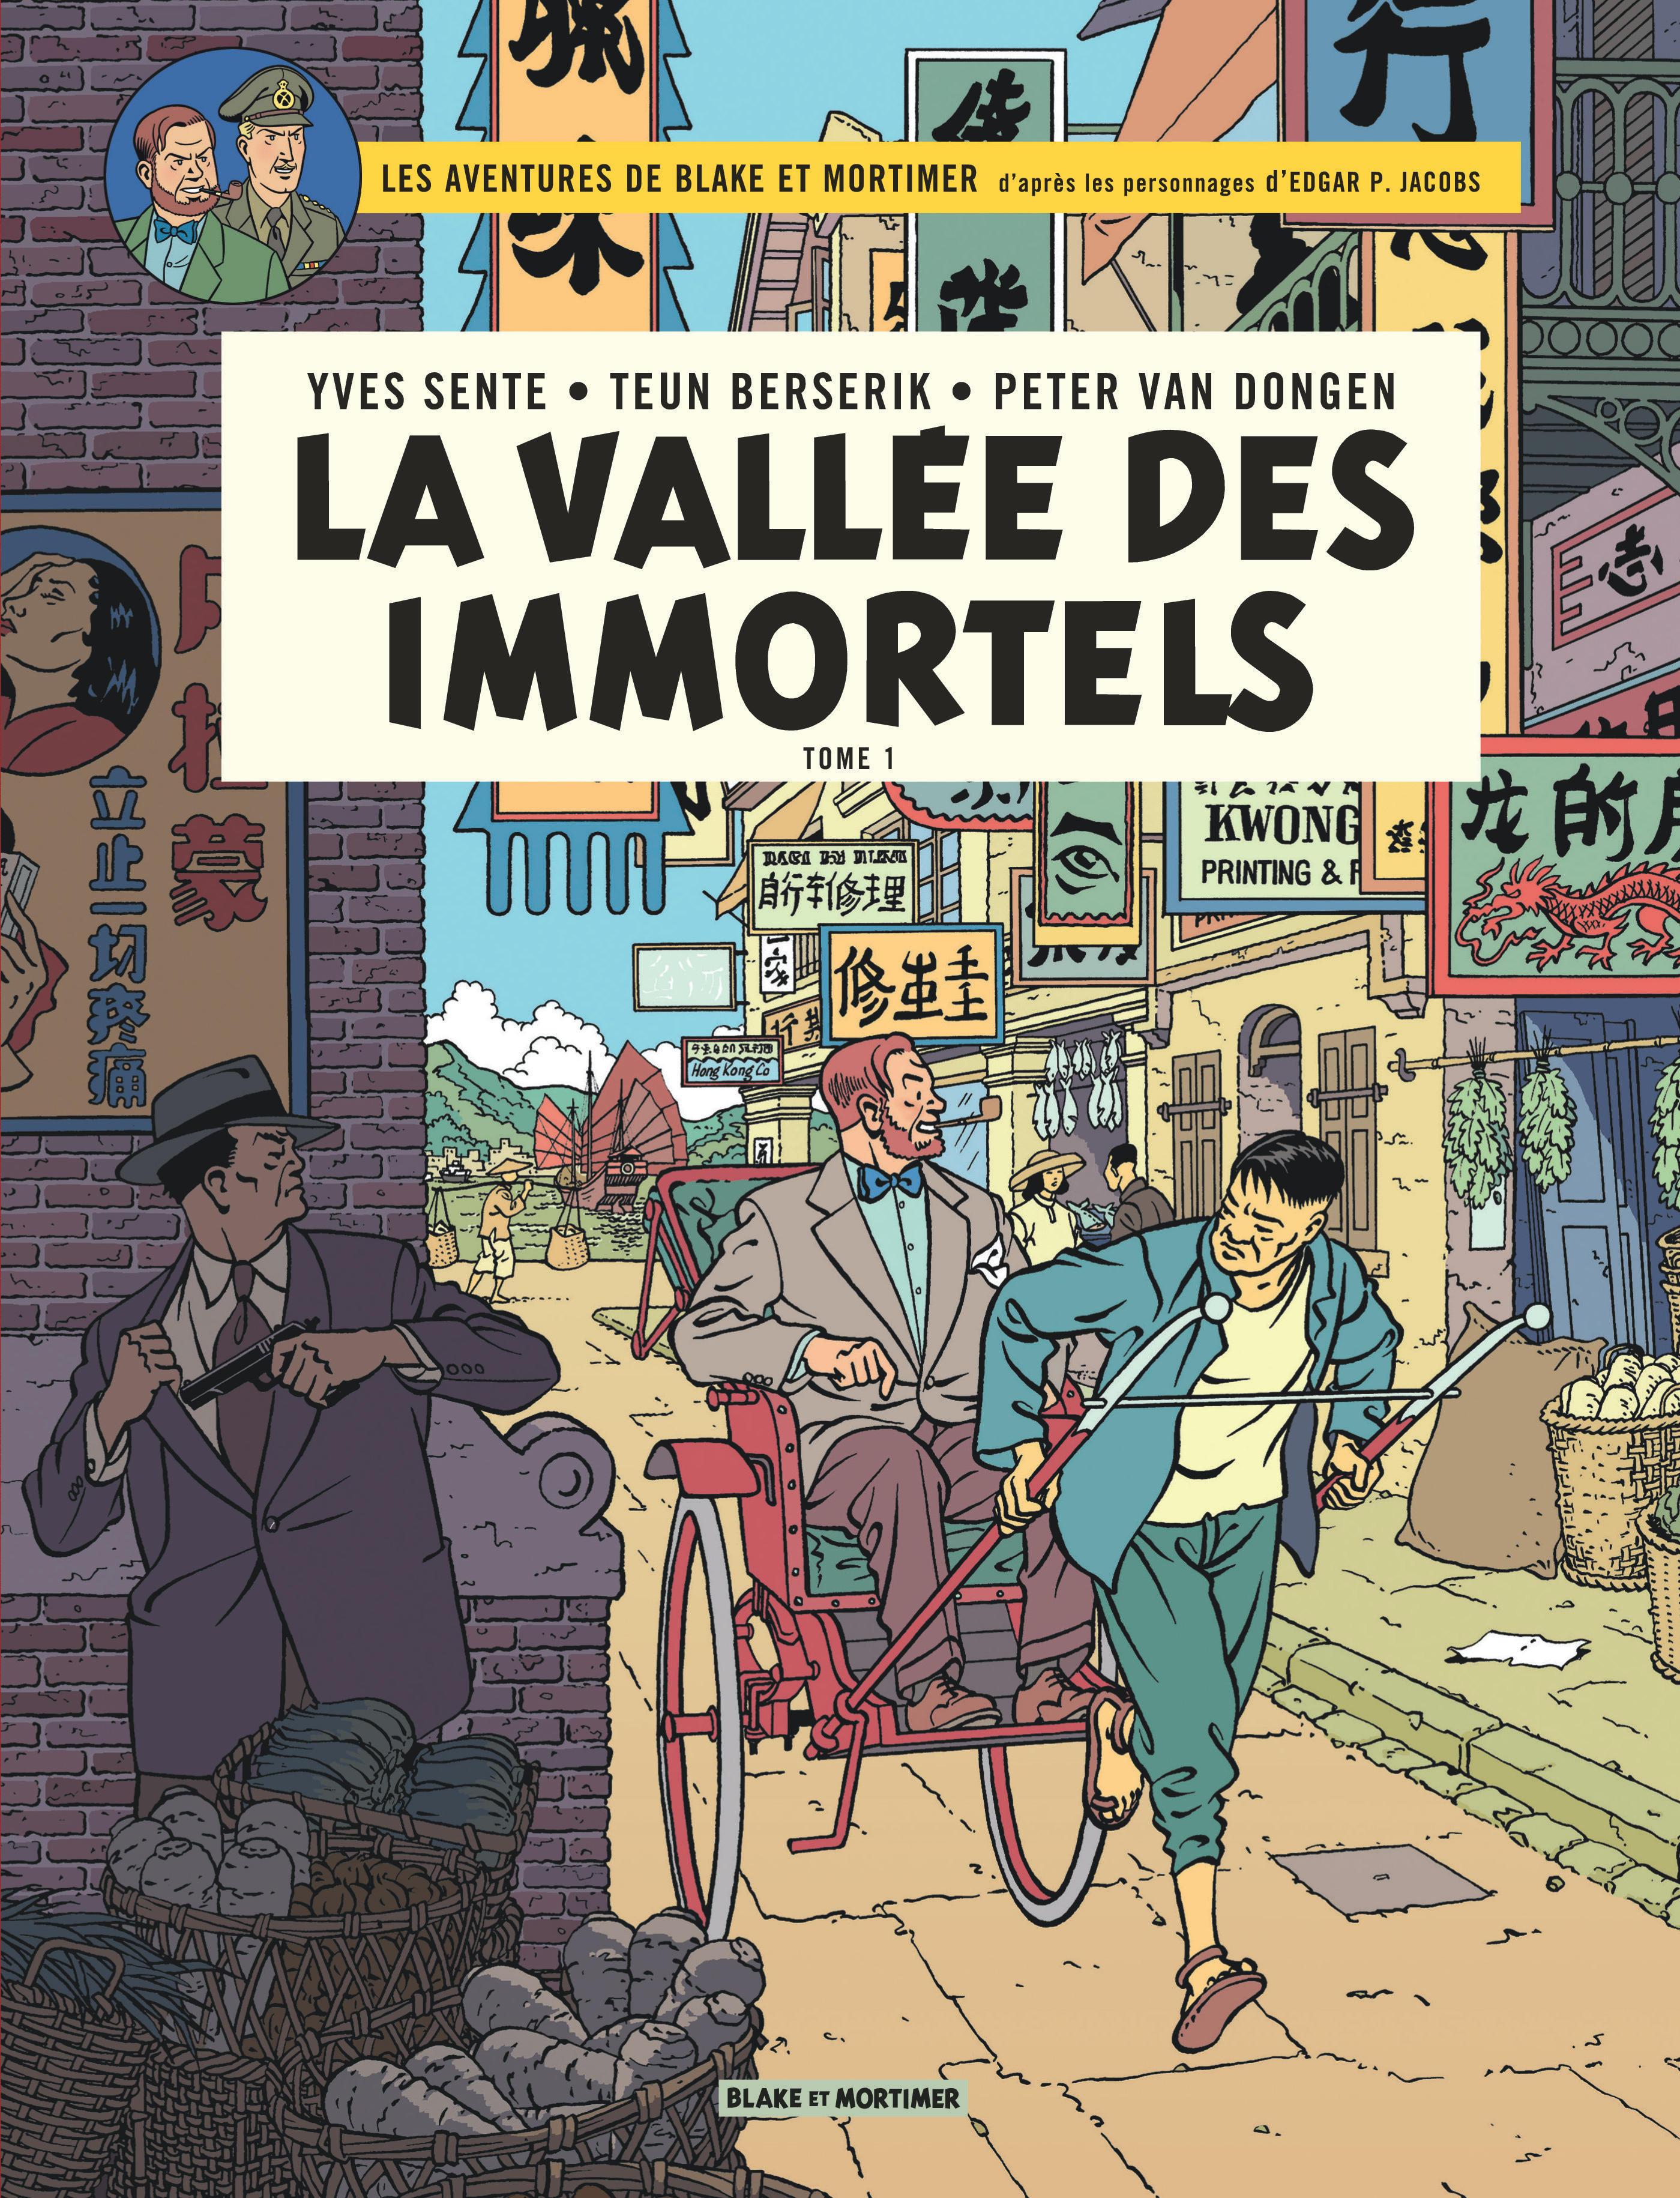 BLAKE ET MORTIMER - T25 - VALLEE DES IMMORTELS (LA) - TOME 1 - MENACE SUR HON